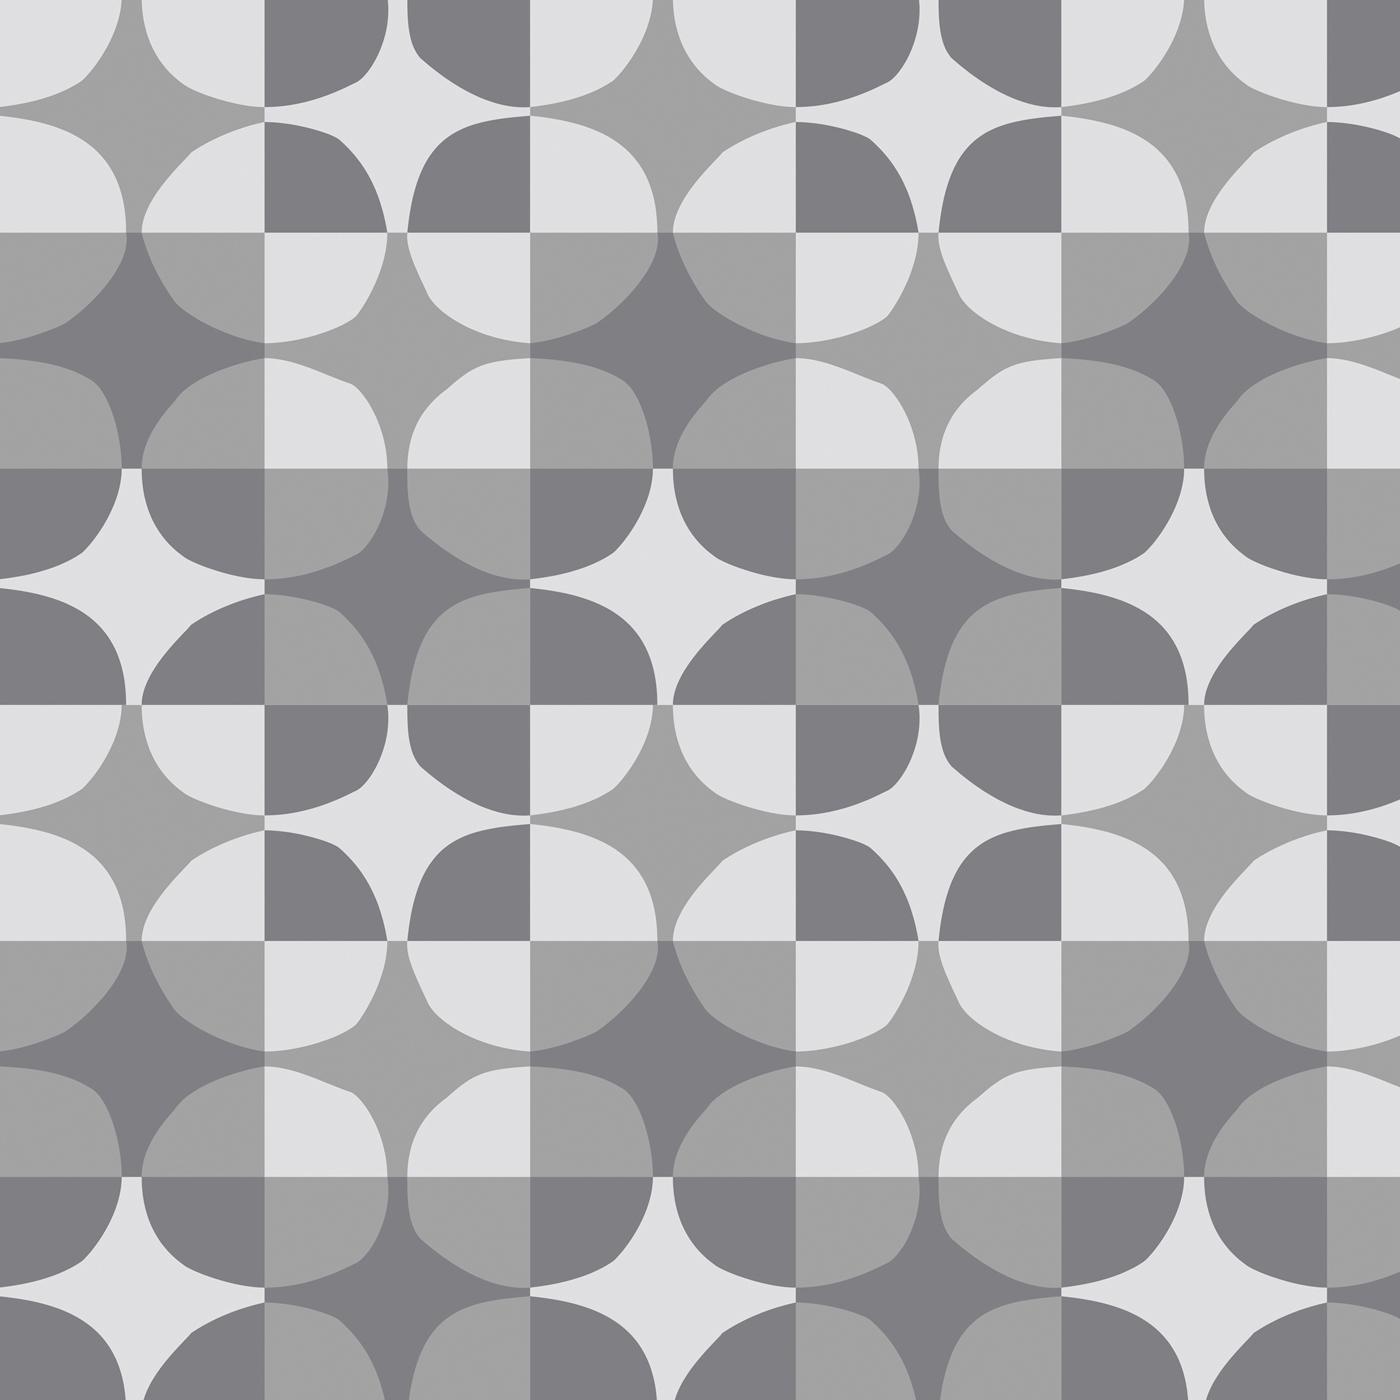 FunMozar Geometric Wallpaper In Gray 1400x1400